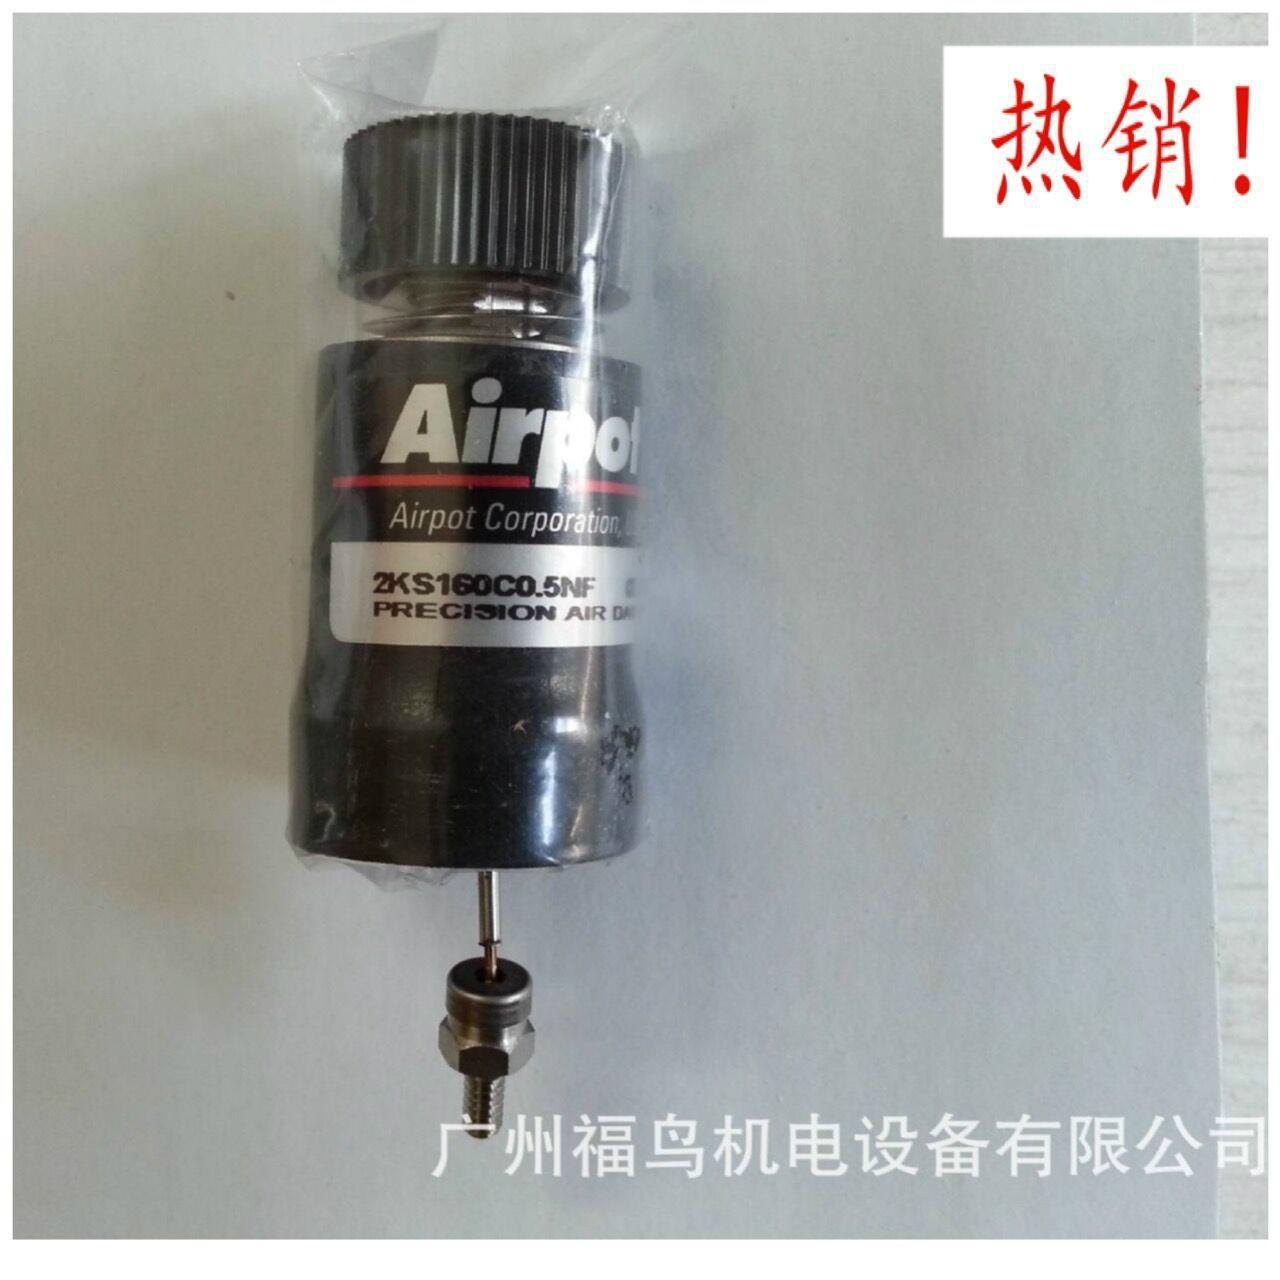 AIRPOT玻璃气缸, 阻尼器  型号: 2KS160C0.5NF